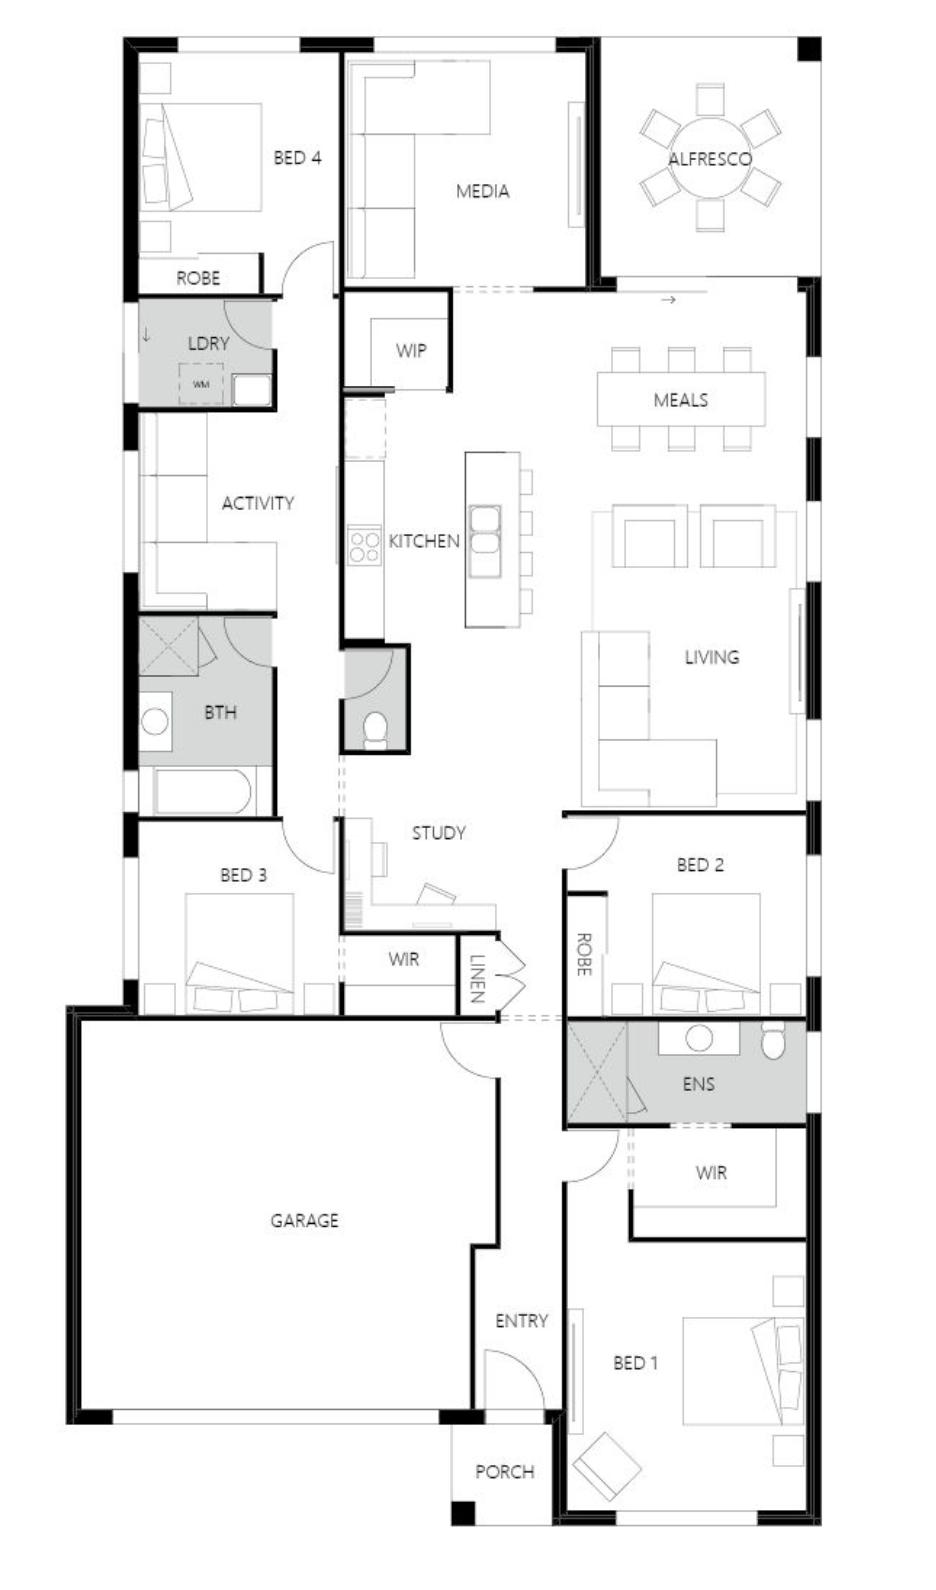 Rosewood Green - Banksia 229 v2 Floor Plan - Hallmark Homes